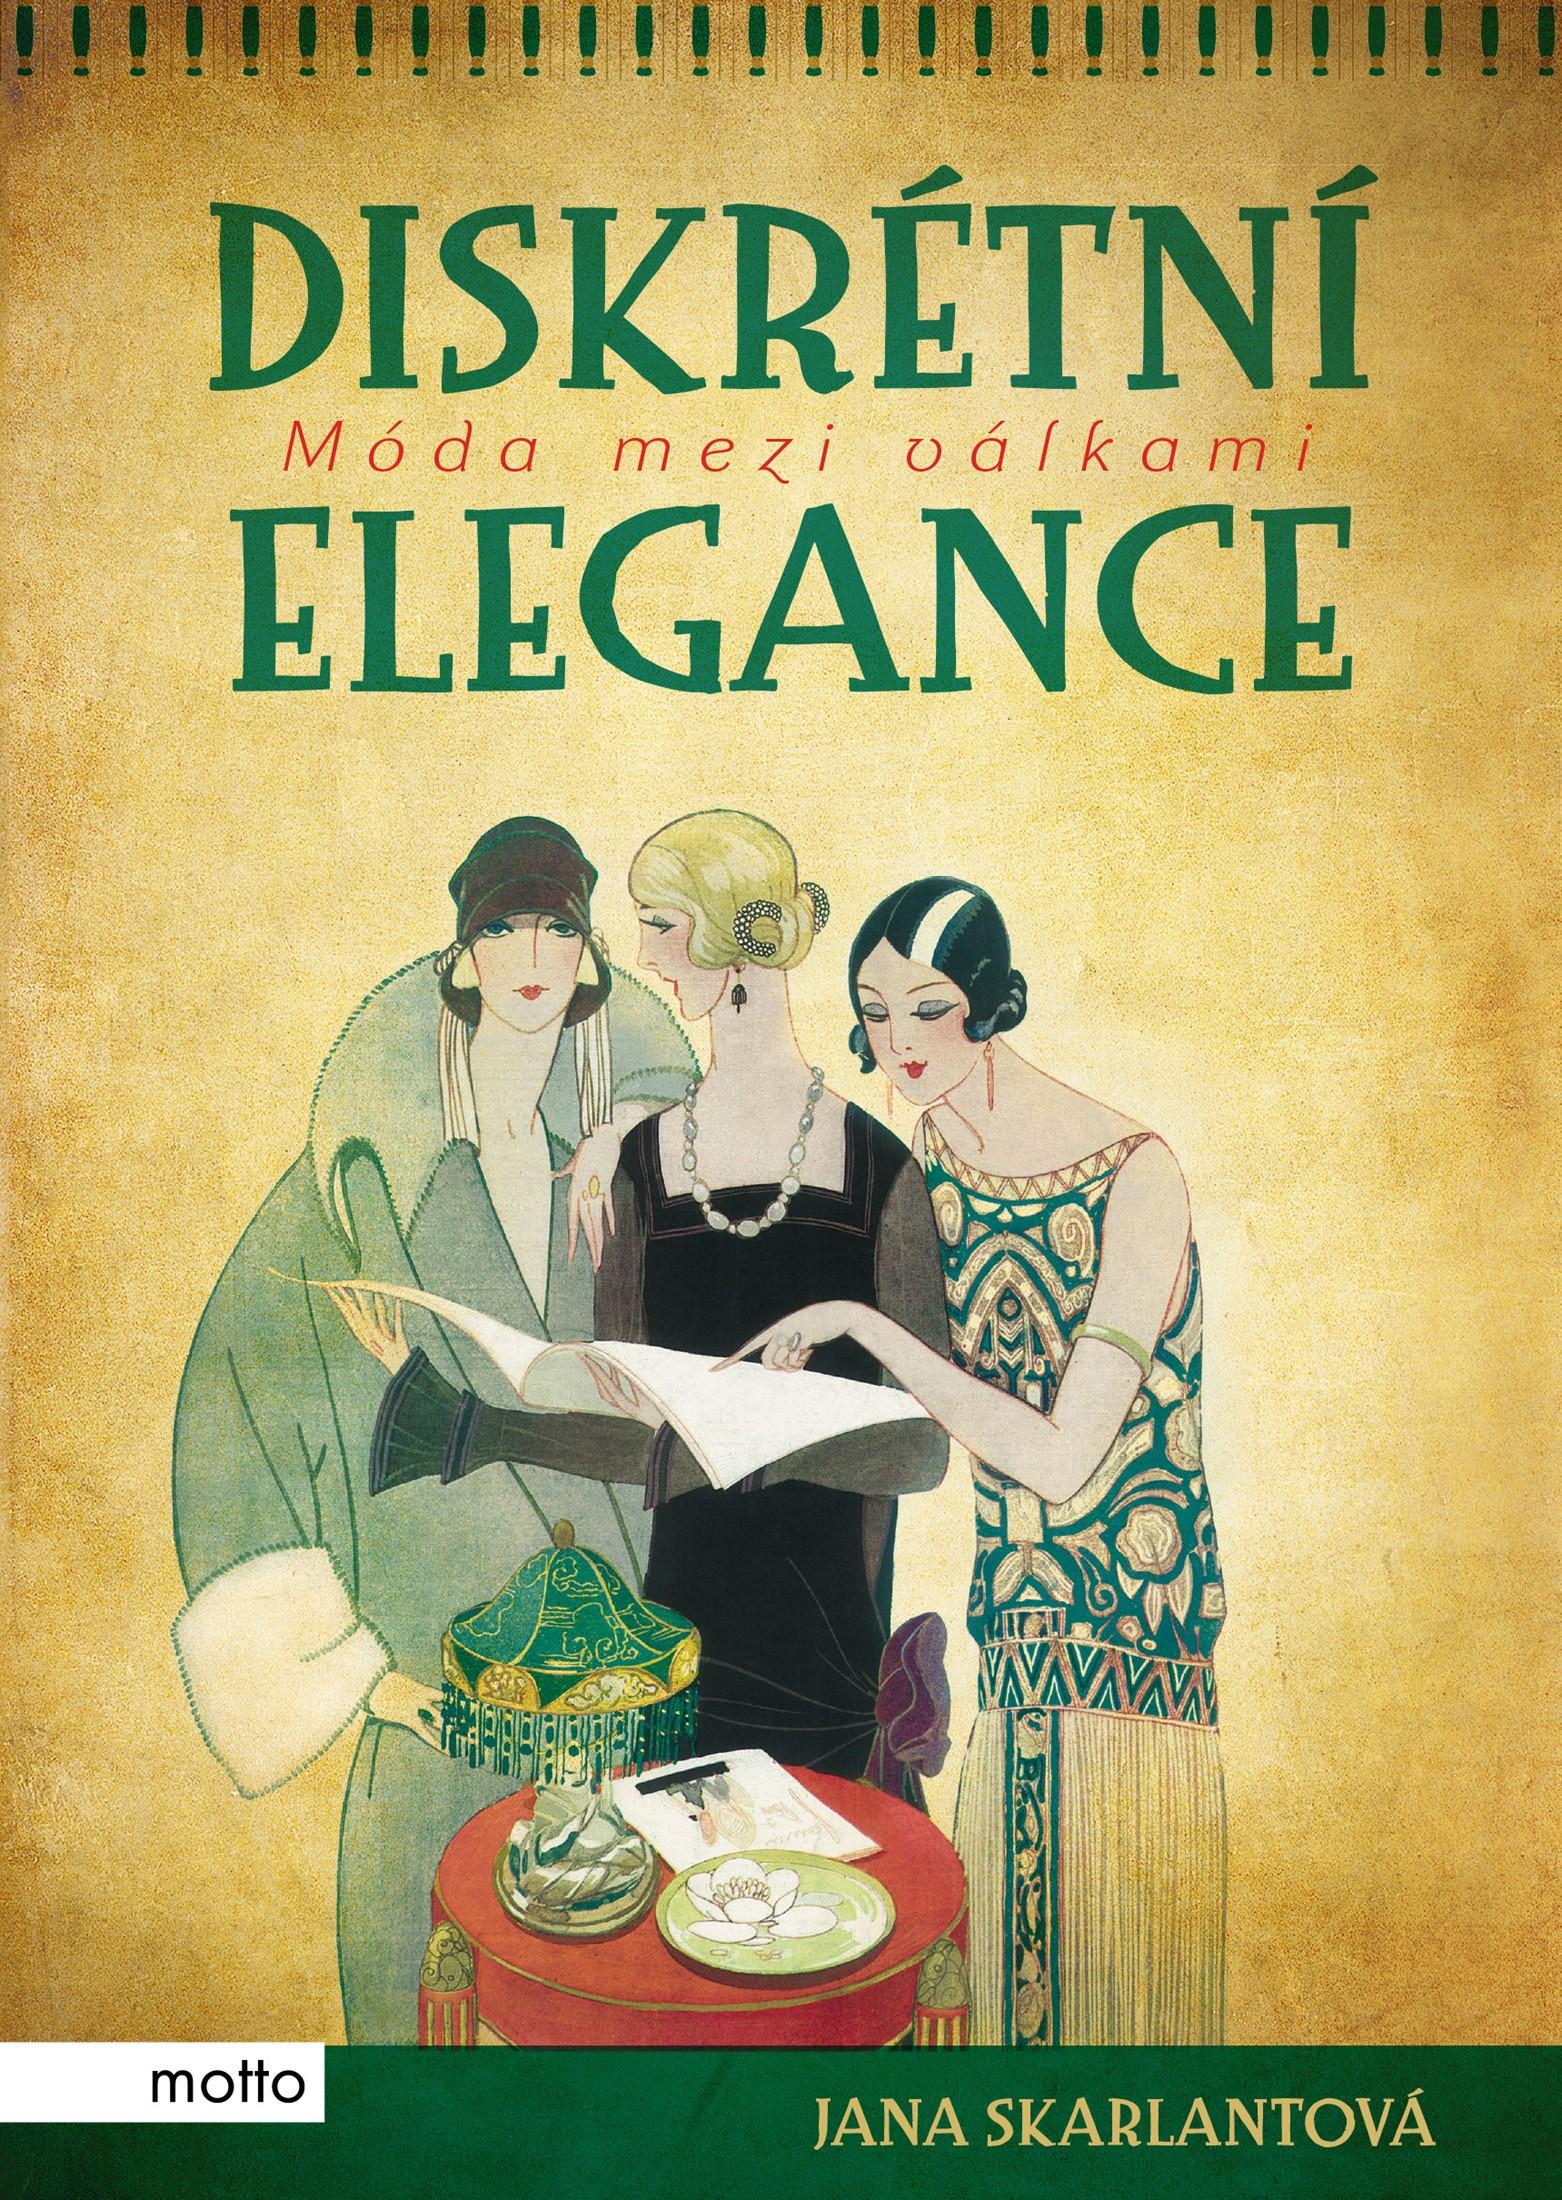 Diskrétní elegance